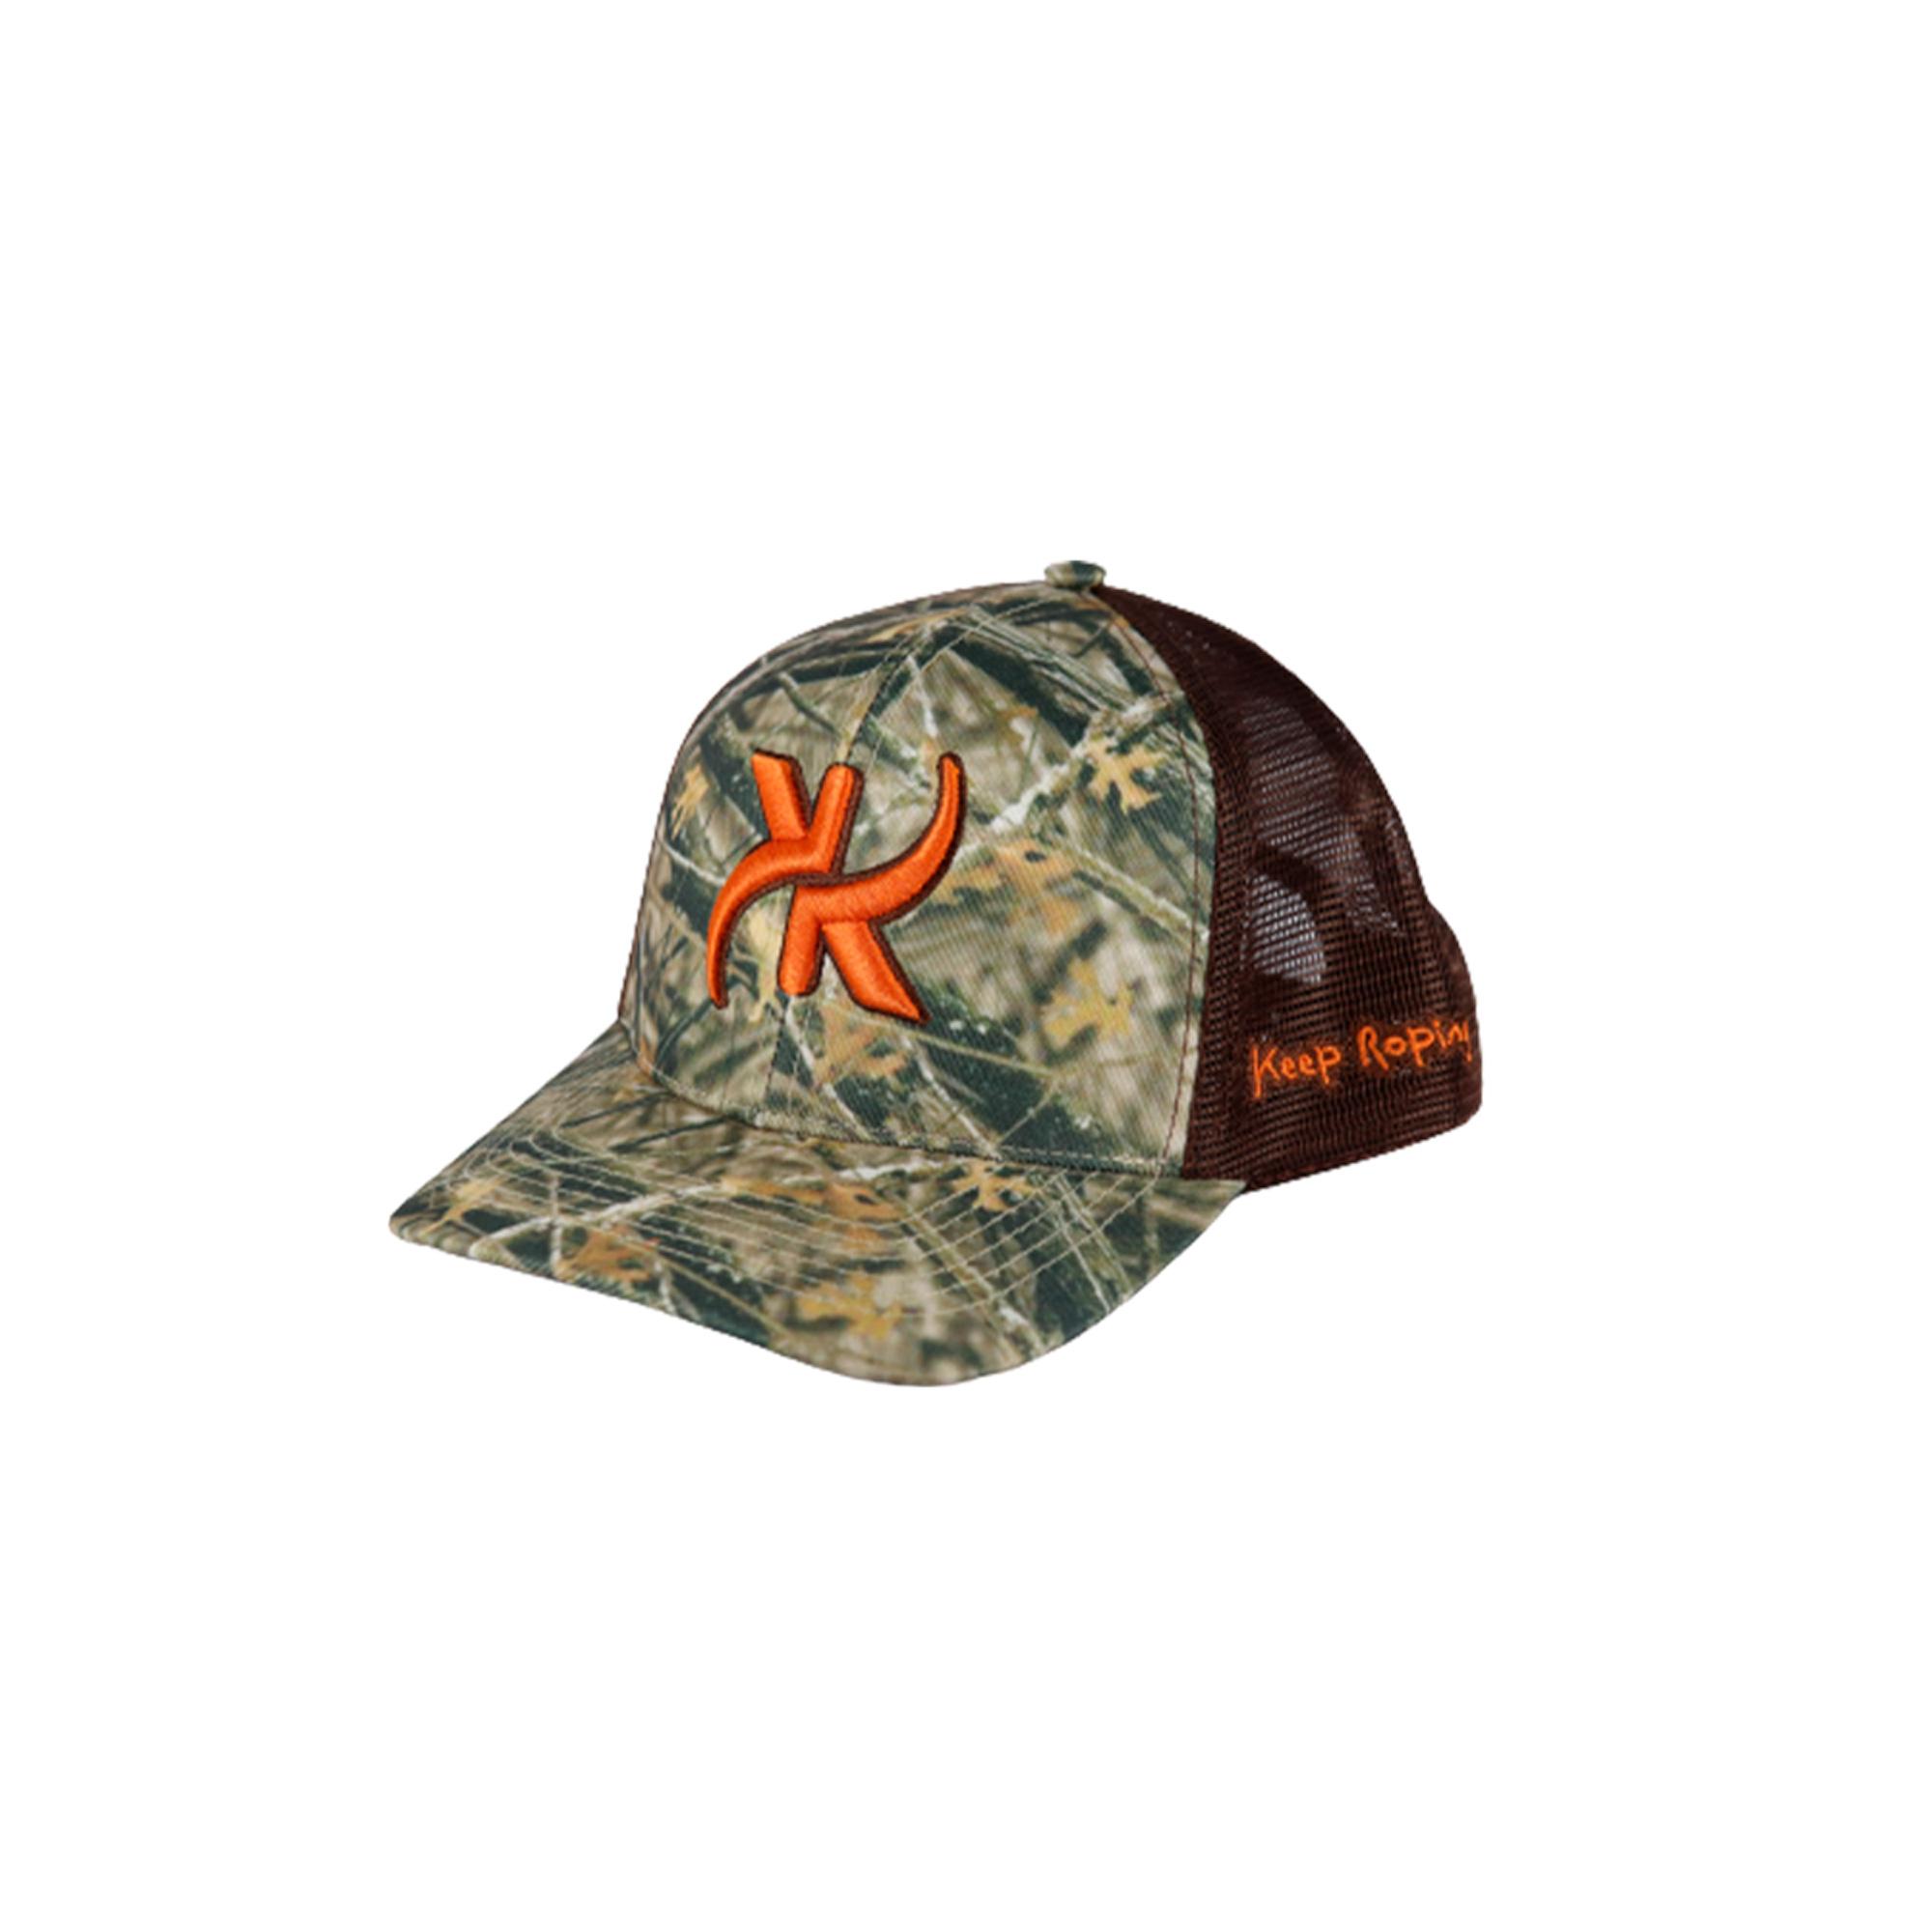 Boné Keep Roping Trucker Hat com aba curva Sublimado/Marrom